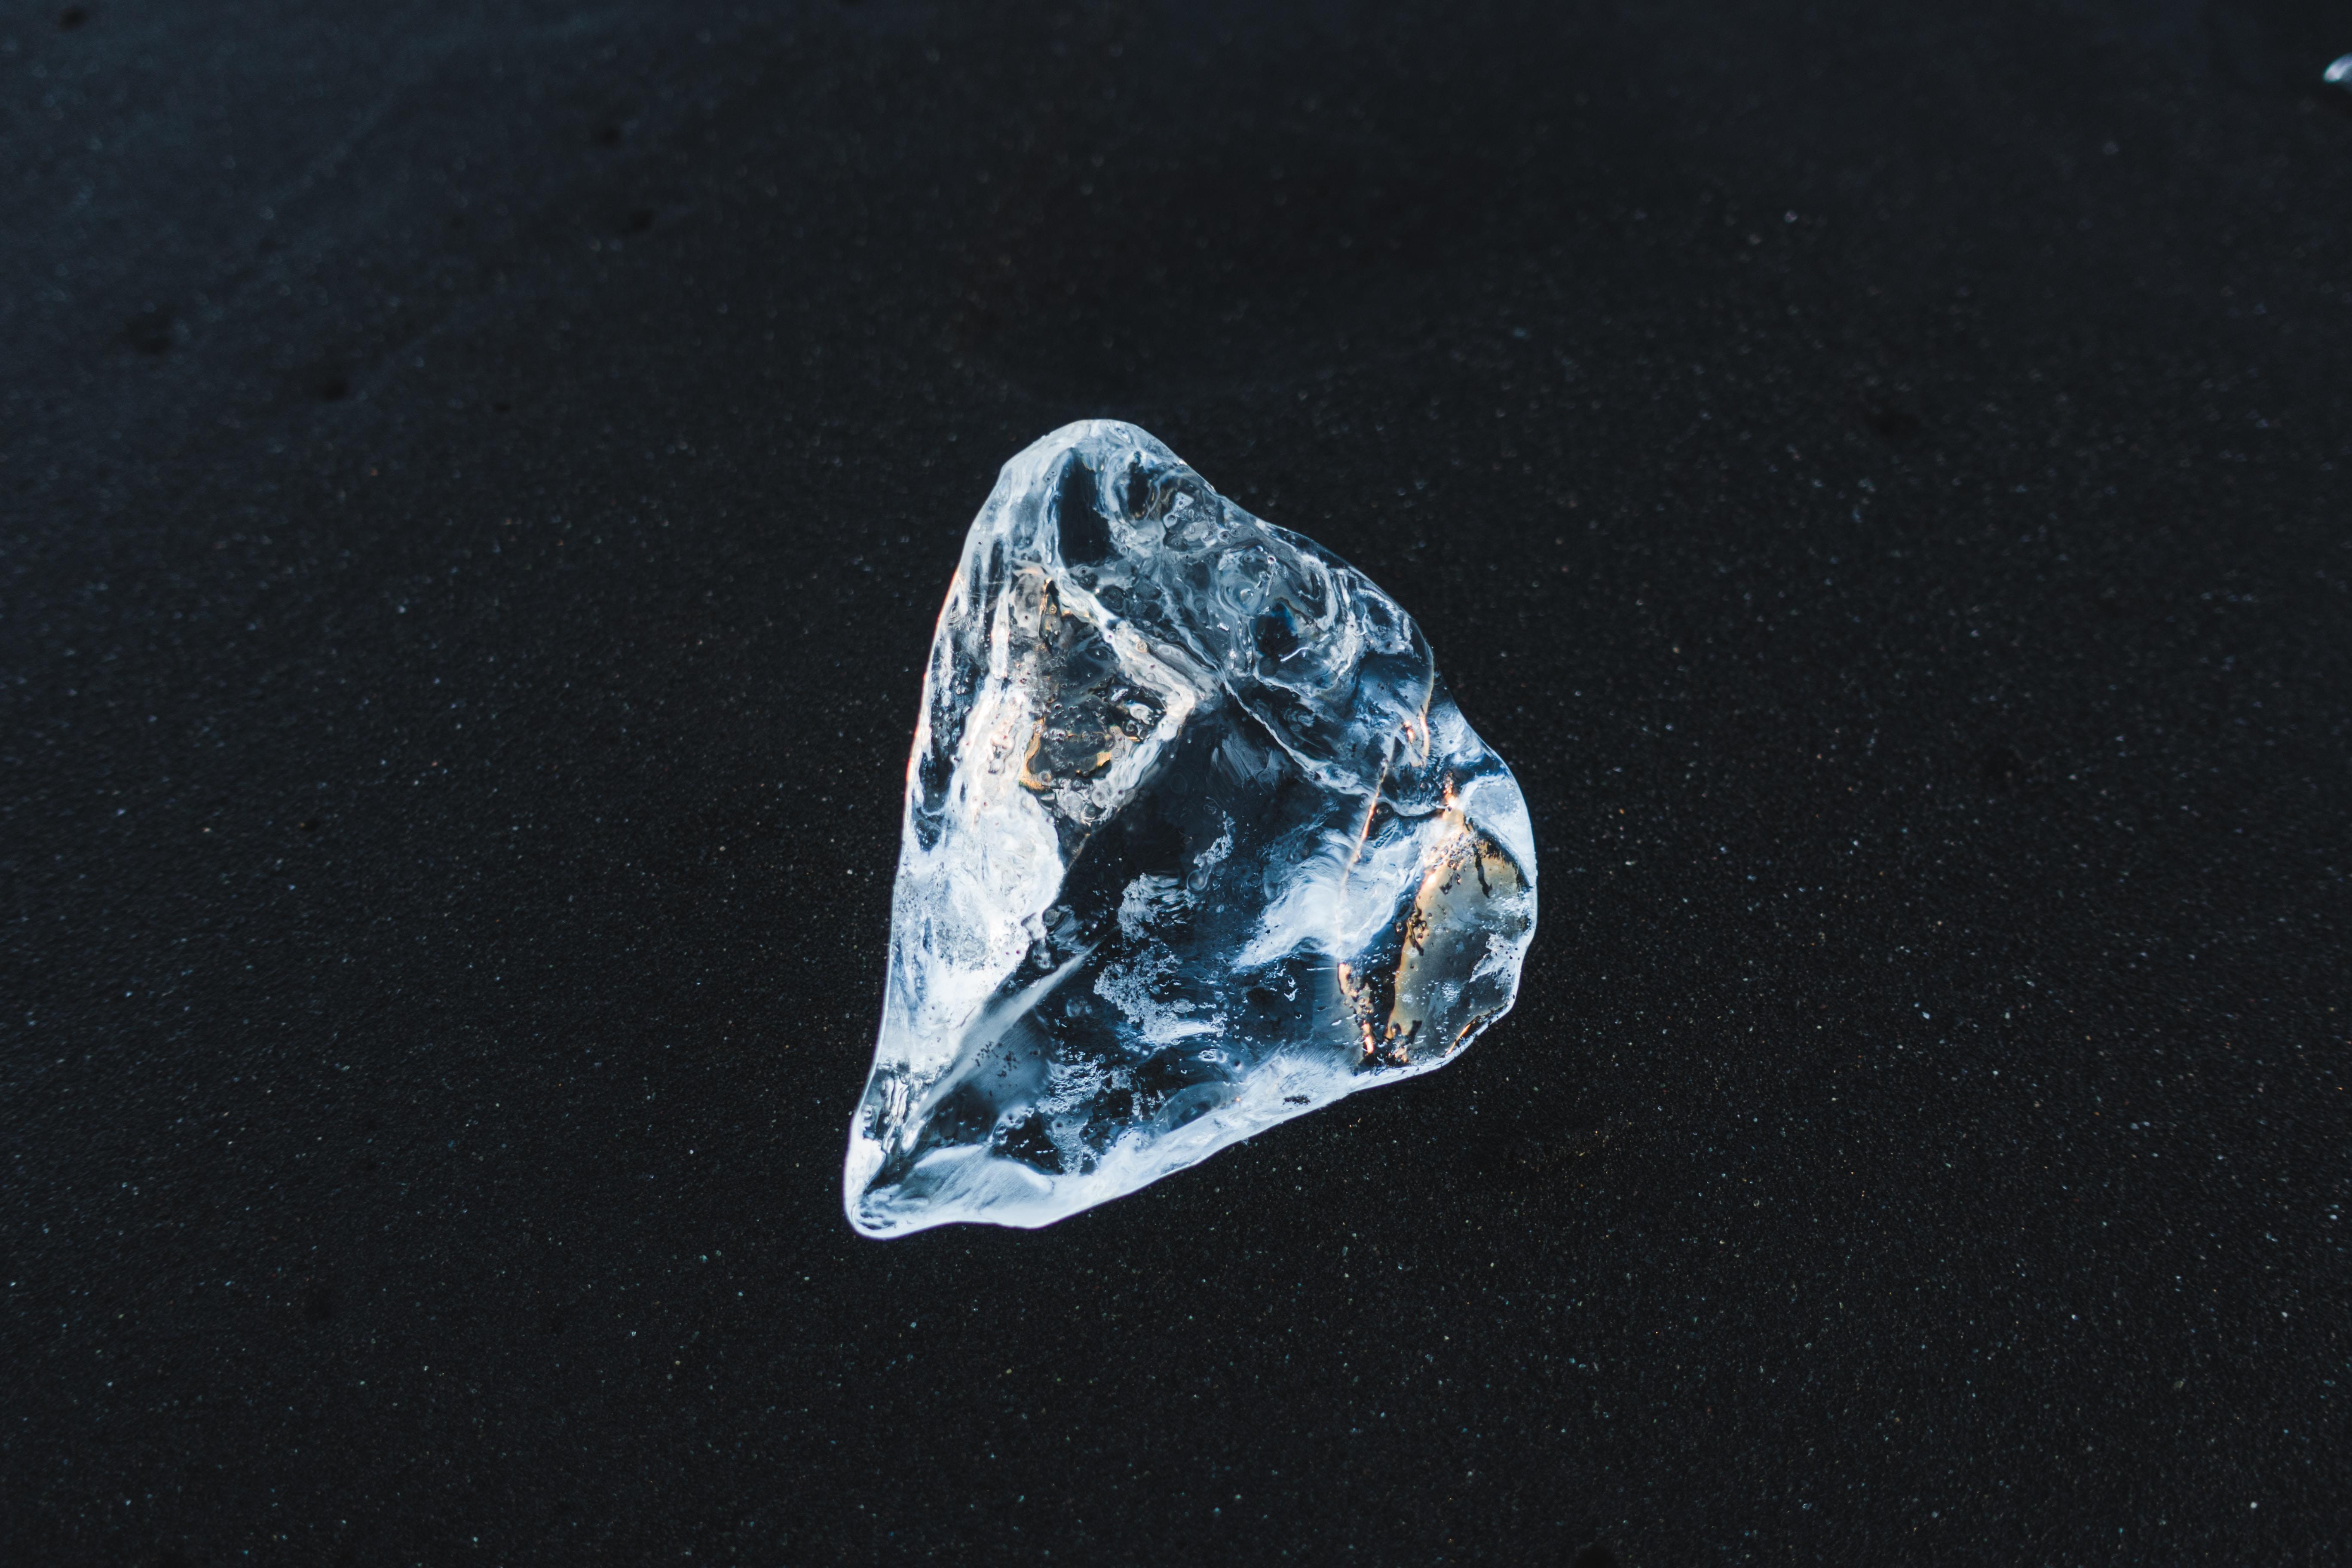 blue rock fragment